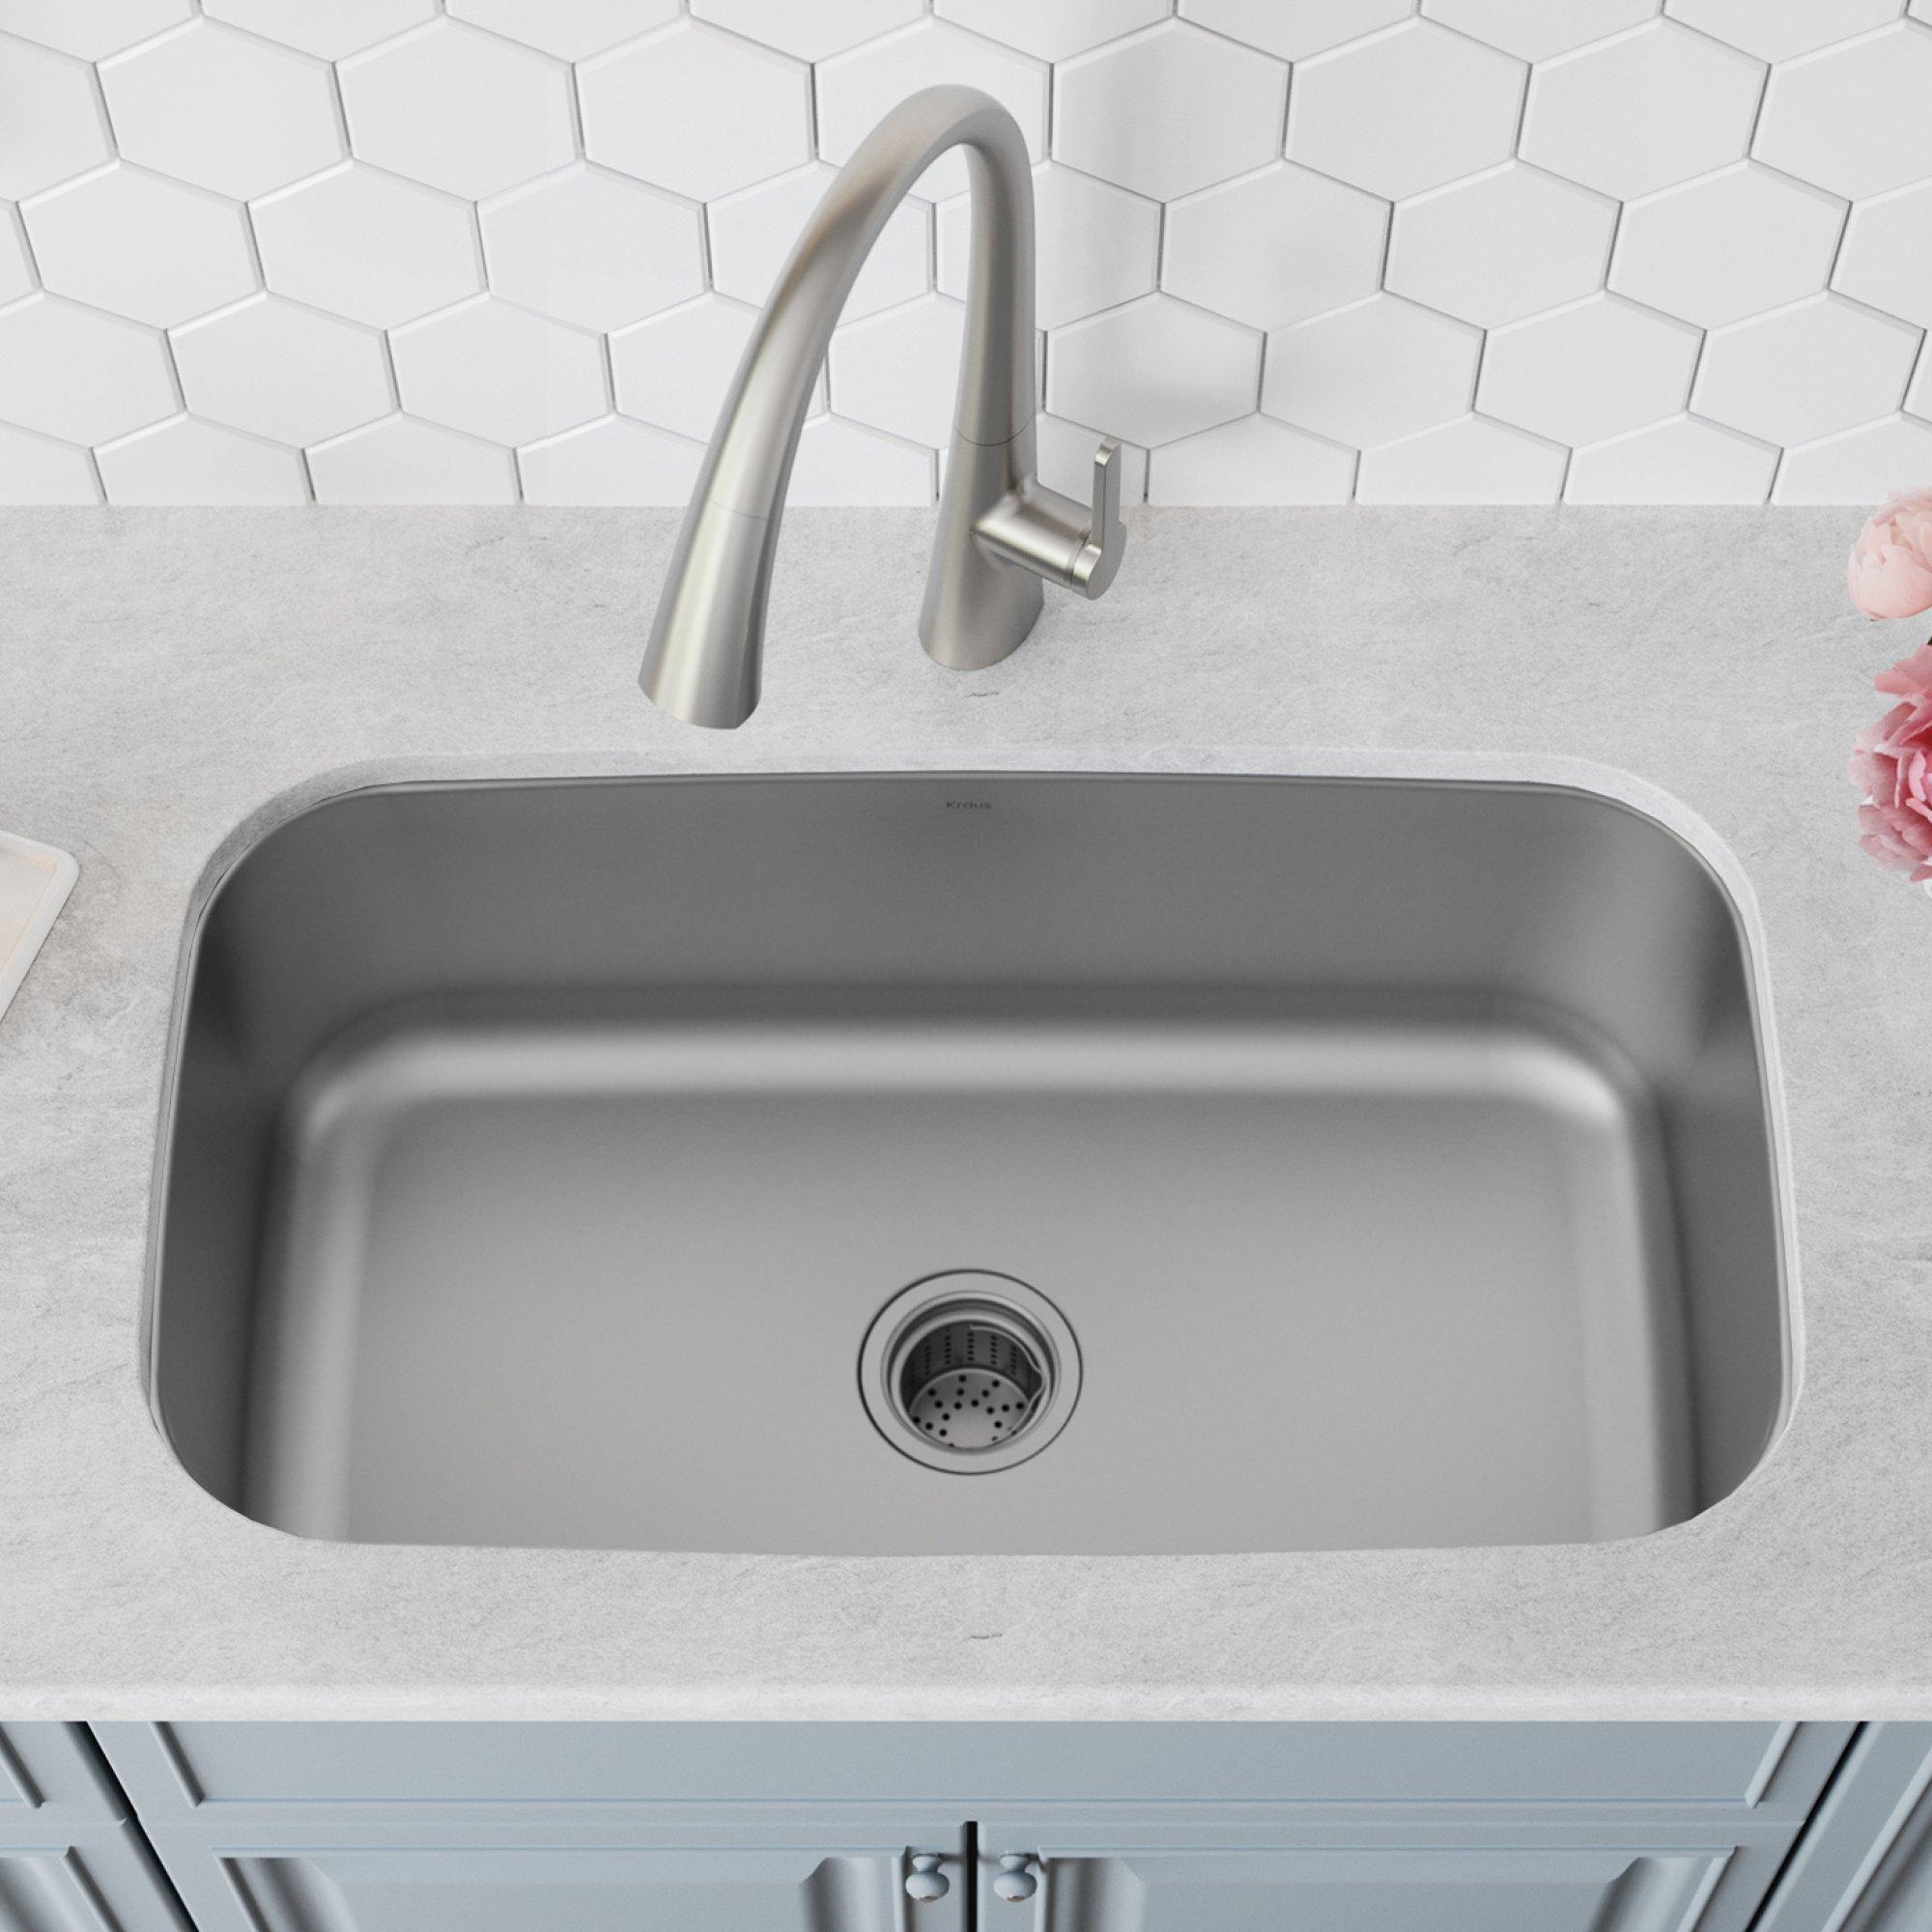 Kraus KBU14 31-1/2 inch Undermount Single Bowl 16-gauge Stainless Steel Kitchen Sink by Kraus (Image #2)